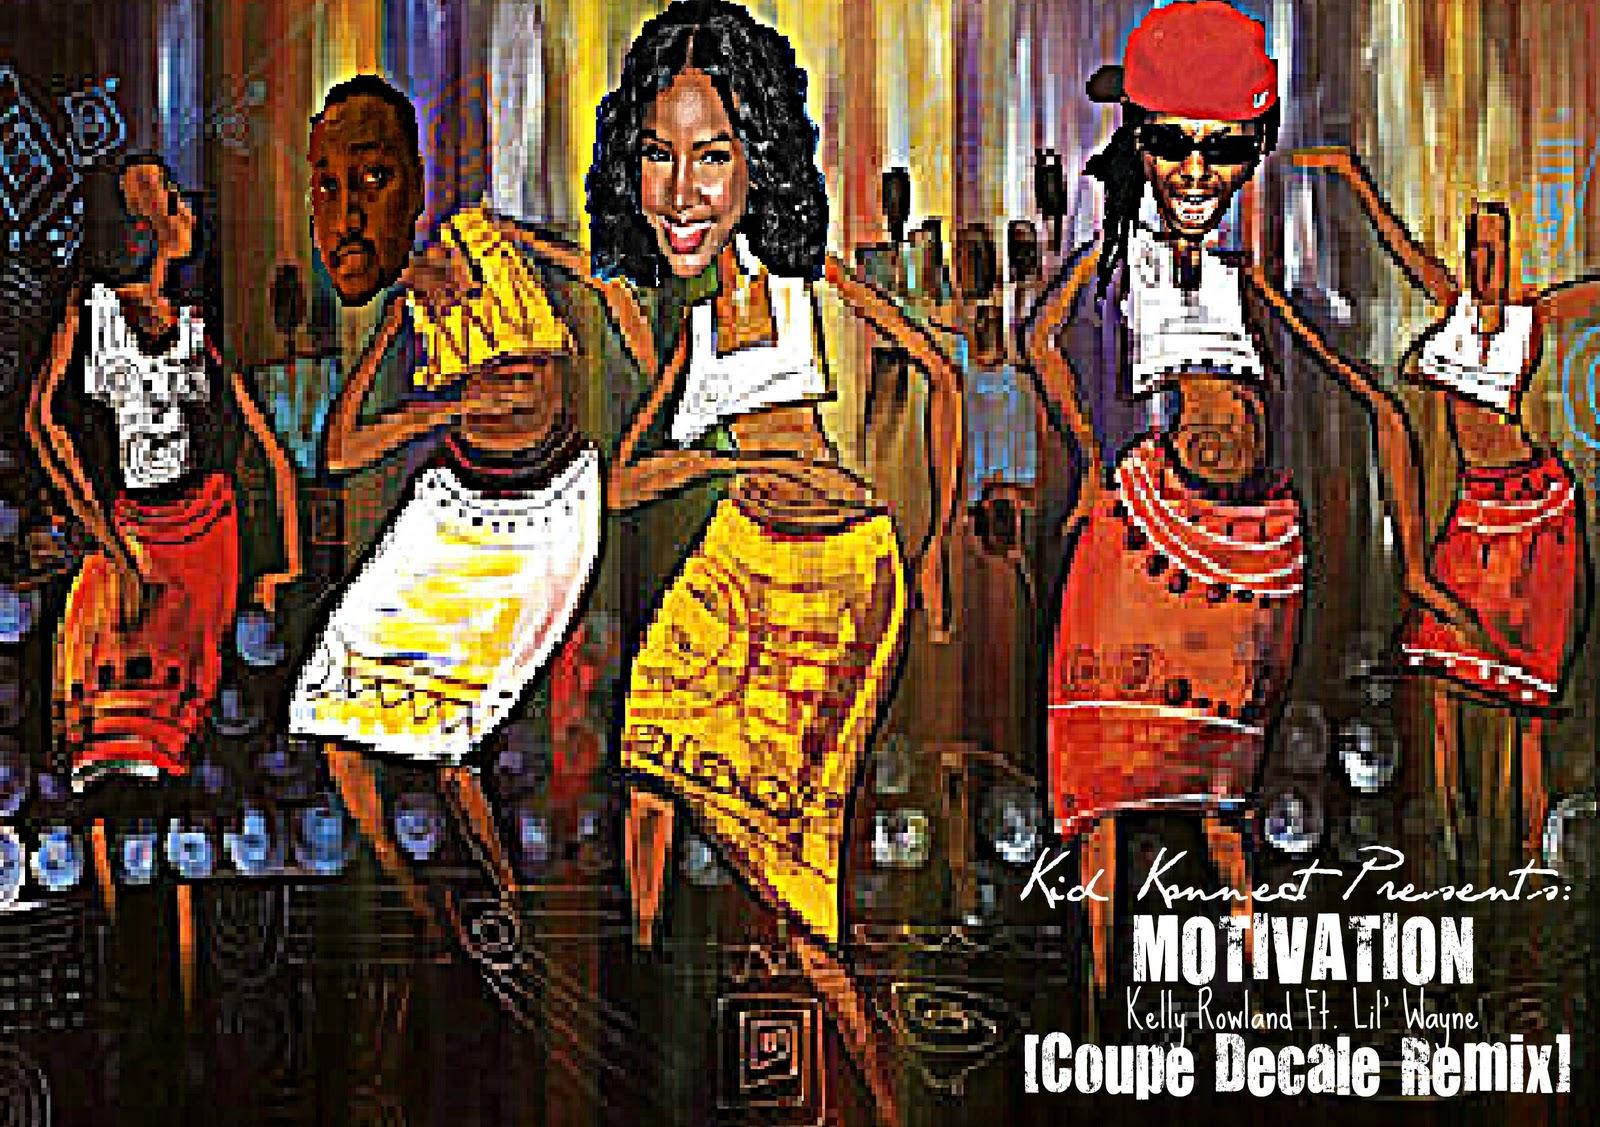 http://3.bp.blogspot.com/-F0kE6VaWdkE/TqVGVuQoOSI/AAAAAAAAAzg/k2d_66TSOgg/s1600/motivationimage.jpg